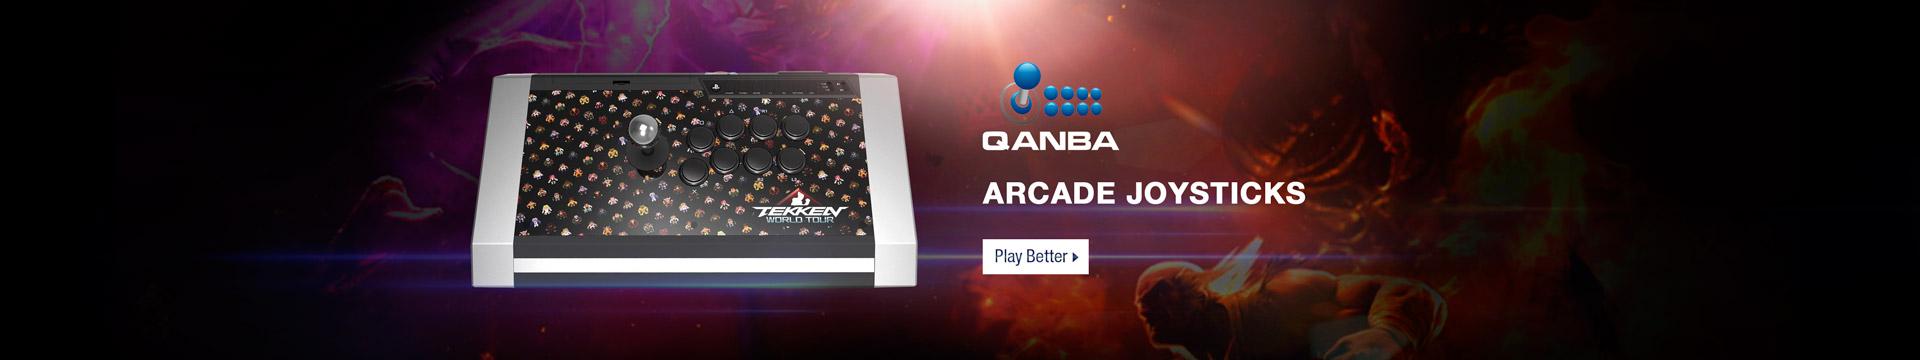 Arcade Joysticks